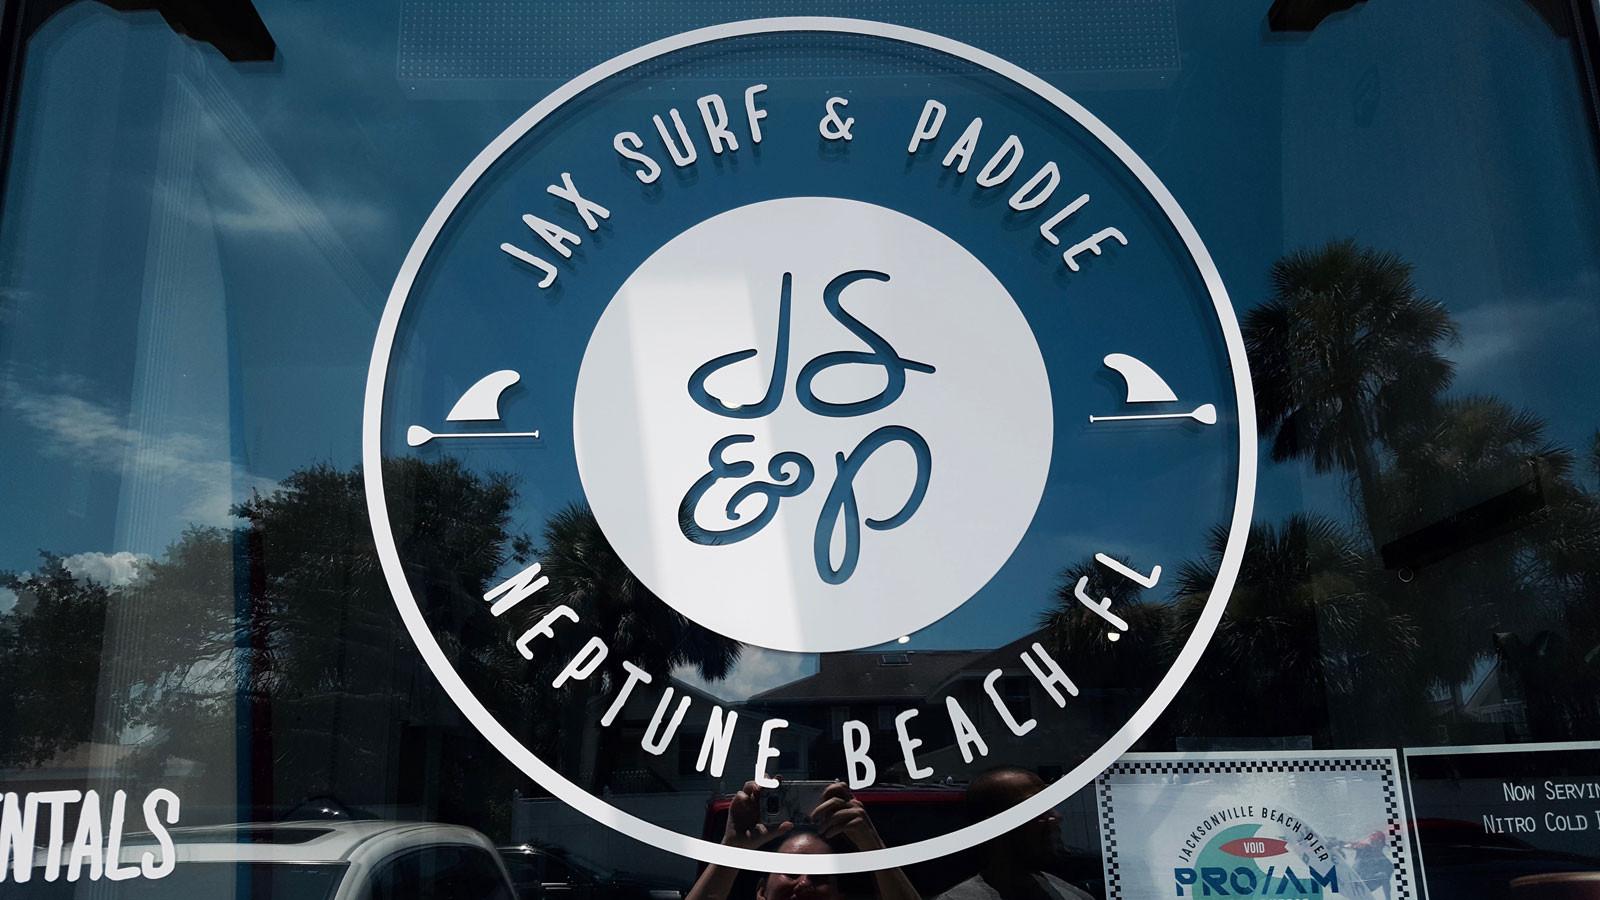 Jax-Surf-and-Paddle.jpg